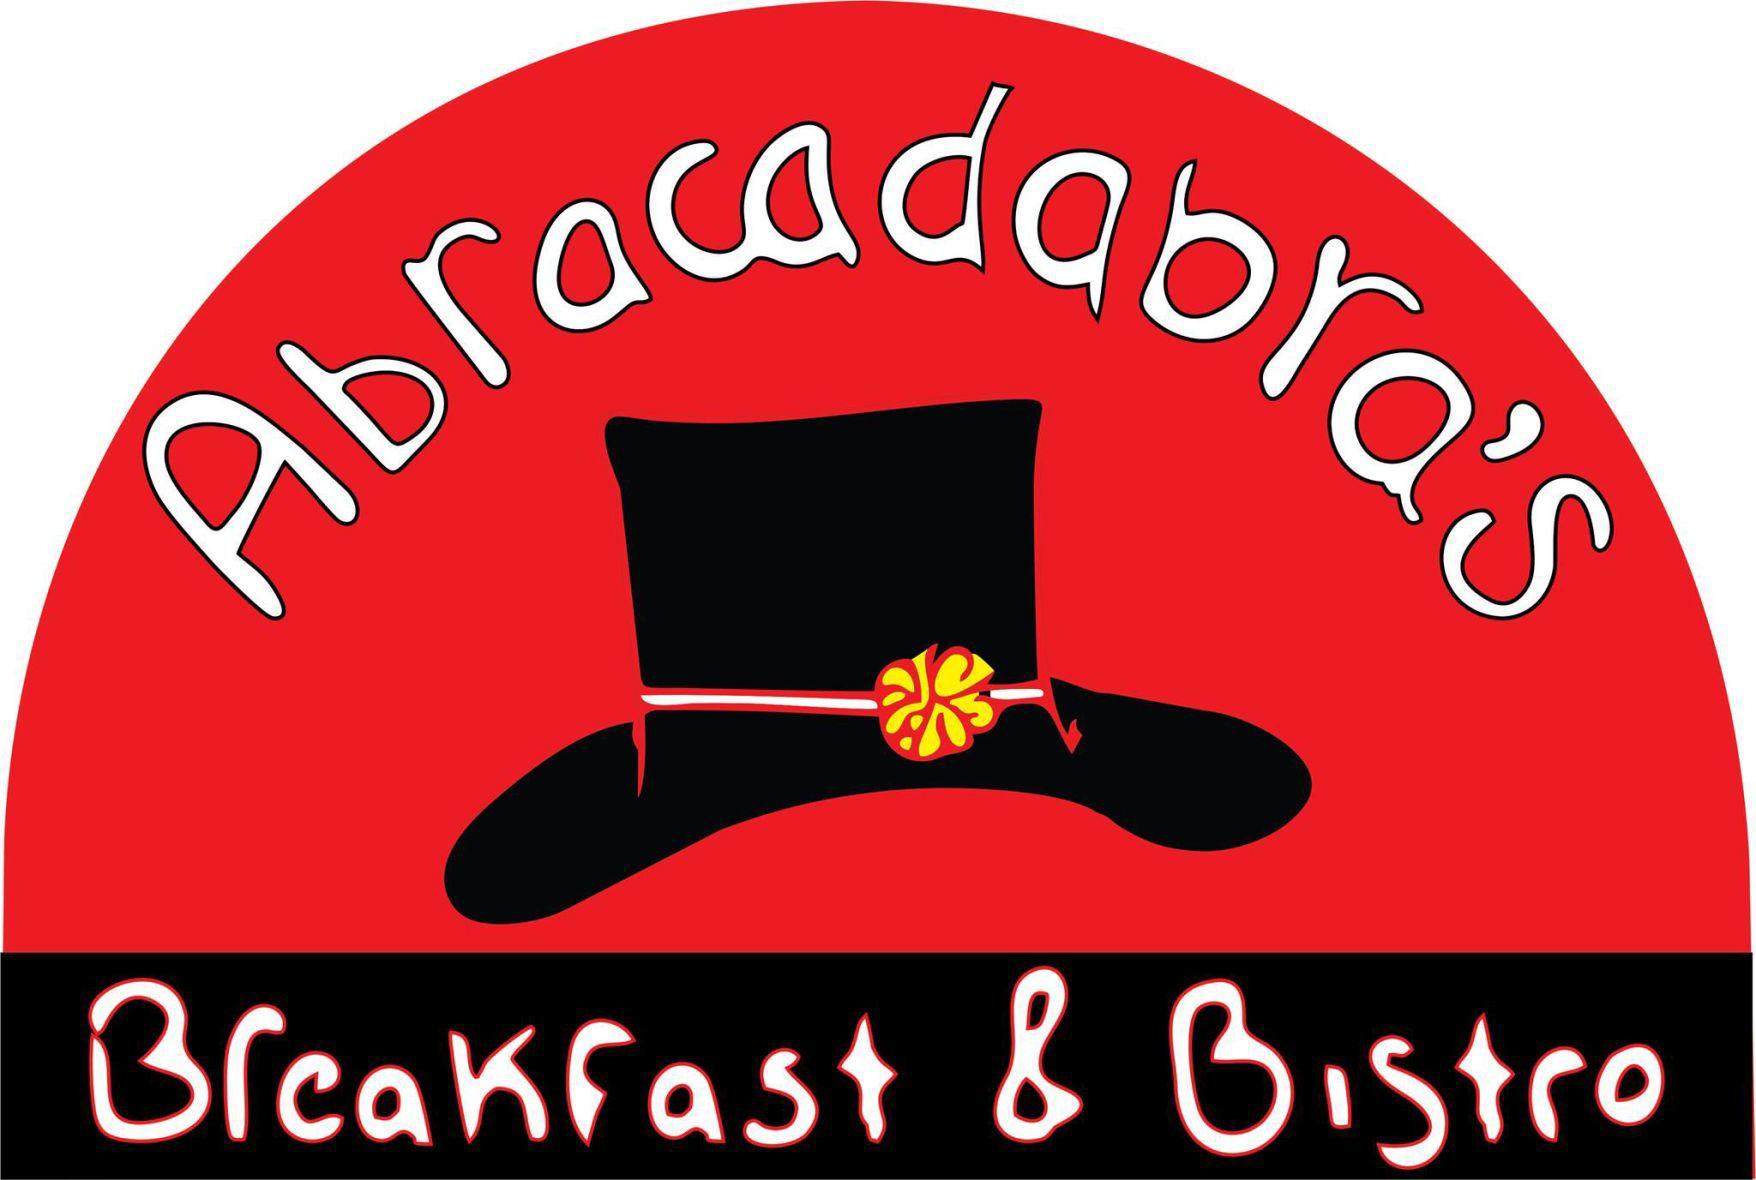 Abracadabrau0027s Breakfast U0026 Bistro